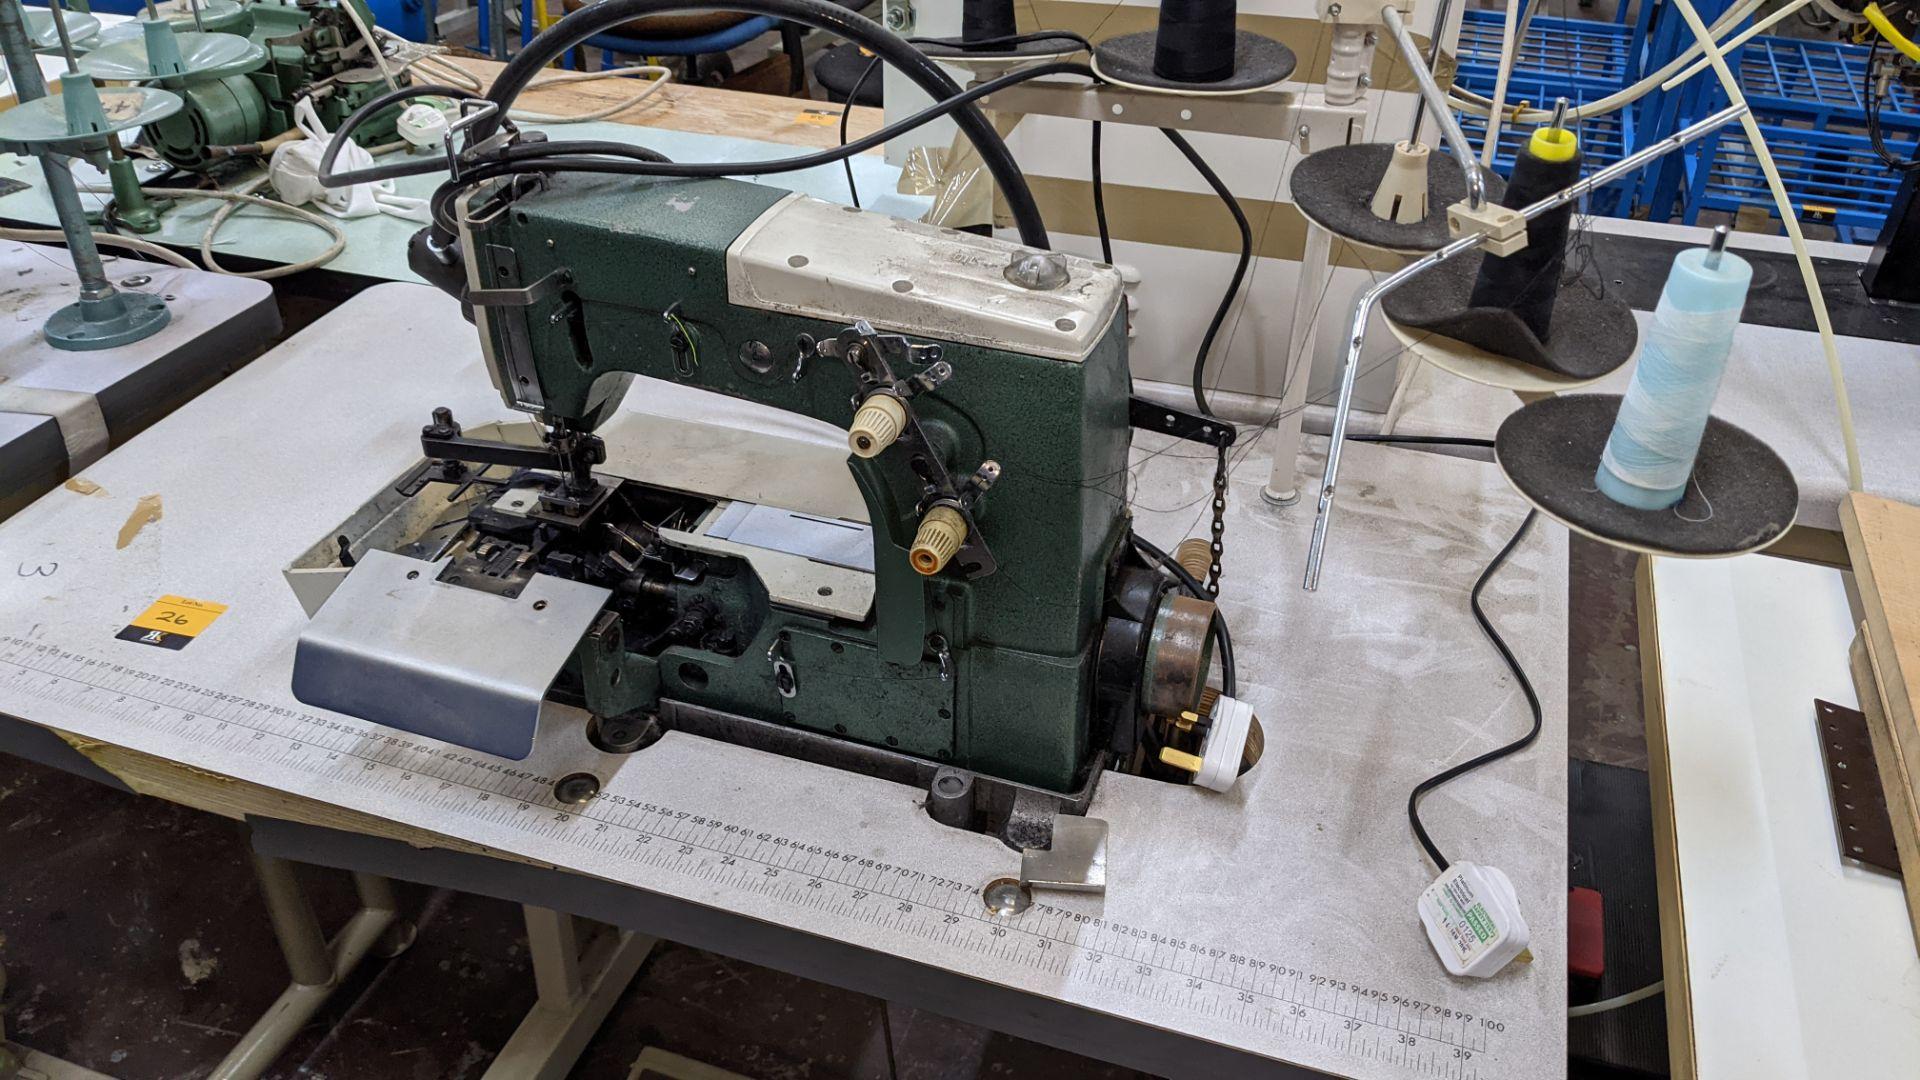 Sewing machine - Image 3 of 16